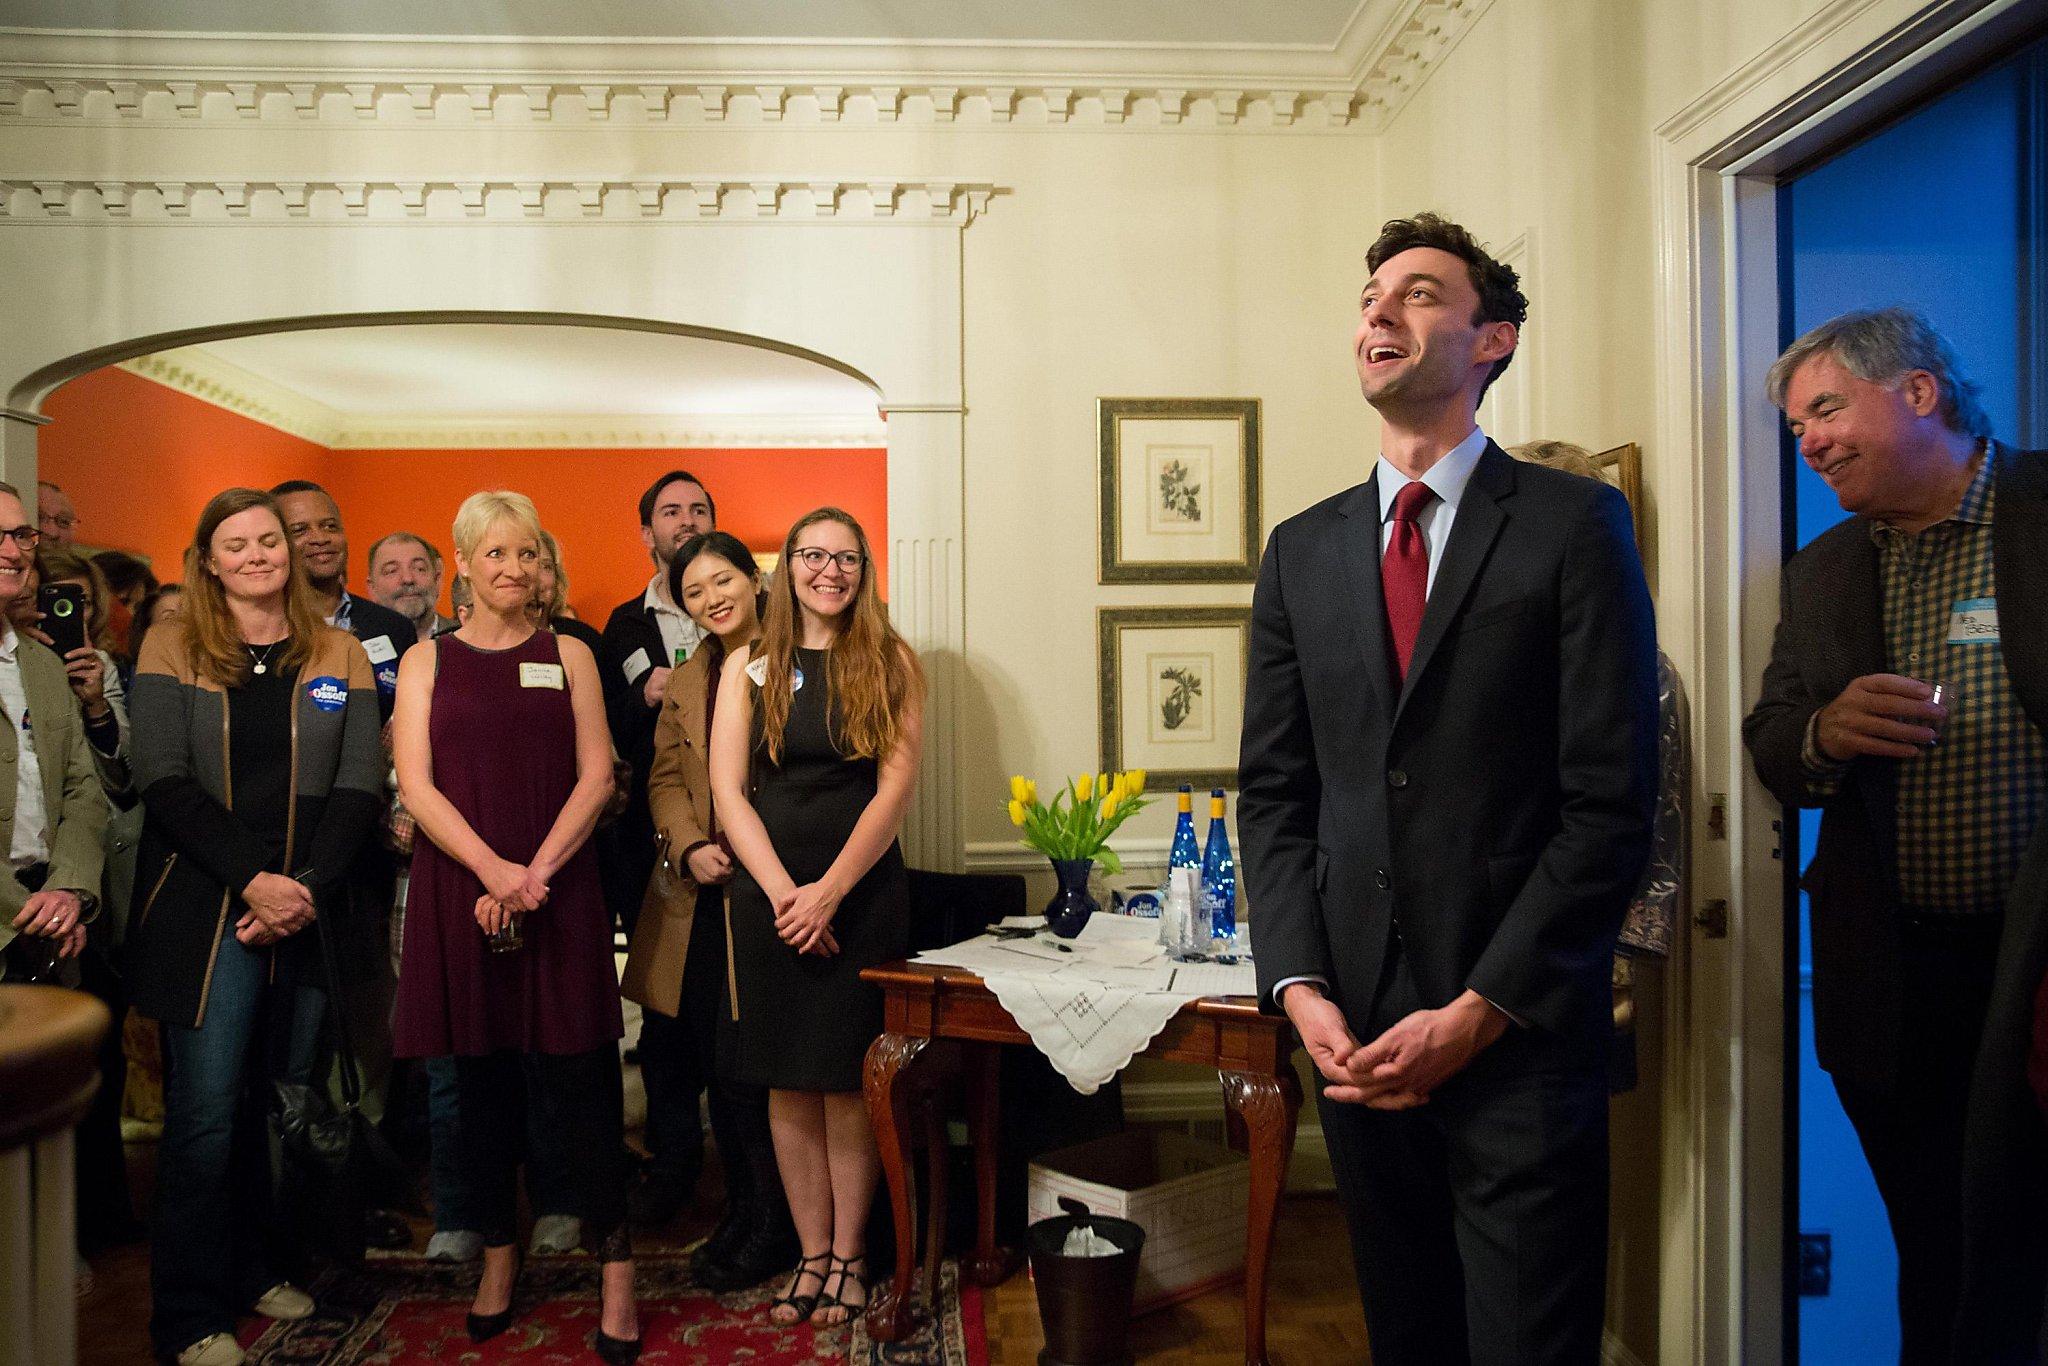 rooz Democrats look for upset in GOP turf image